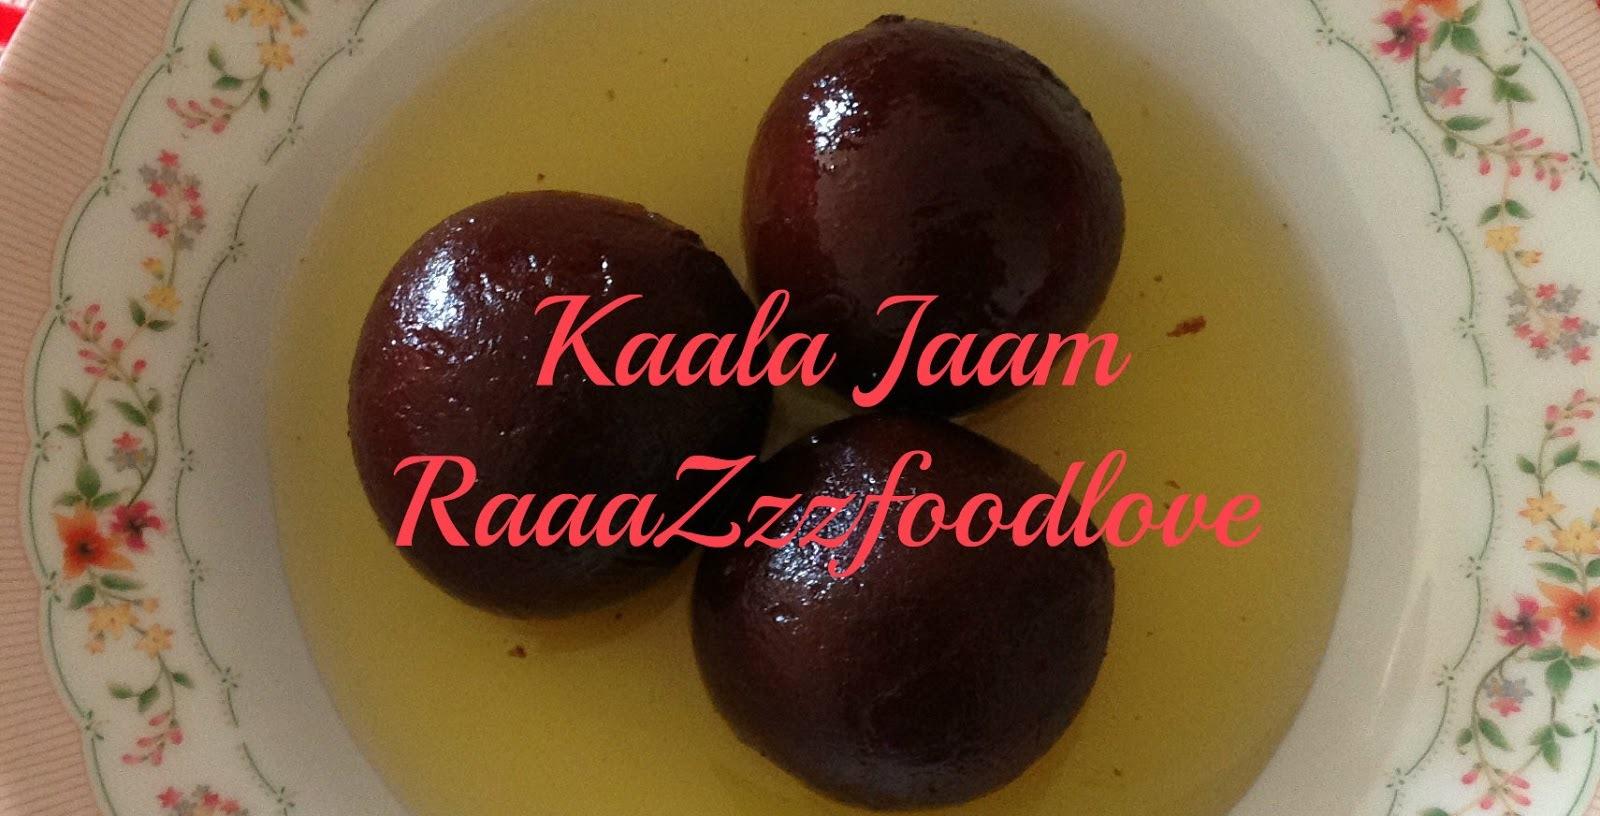 Kaala Jamun